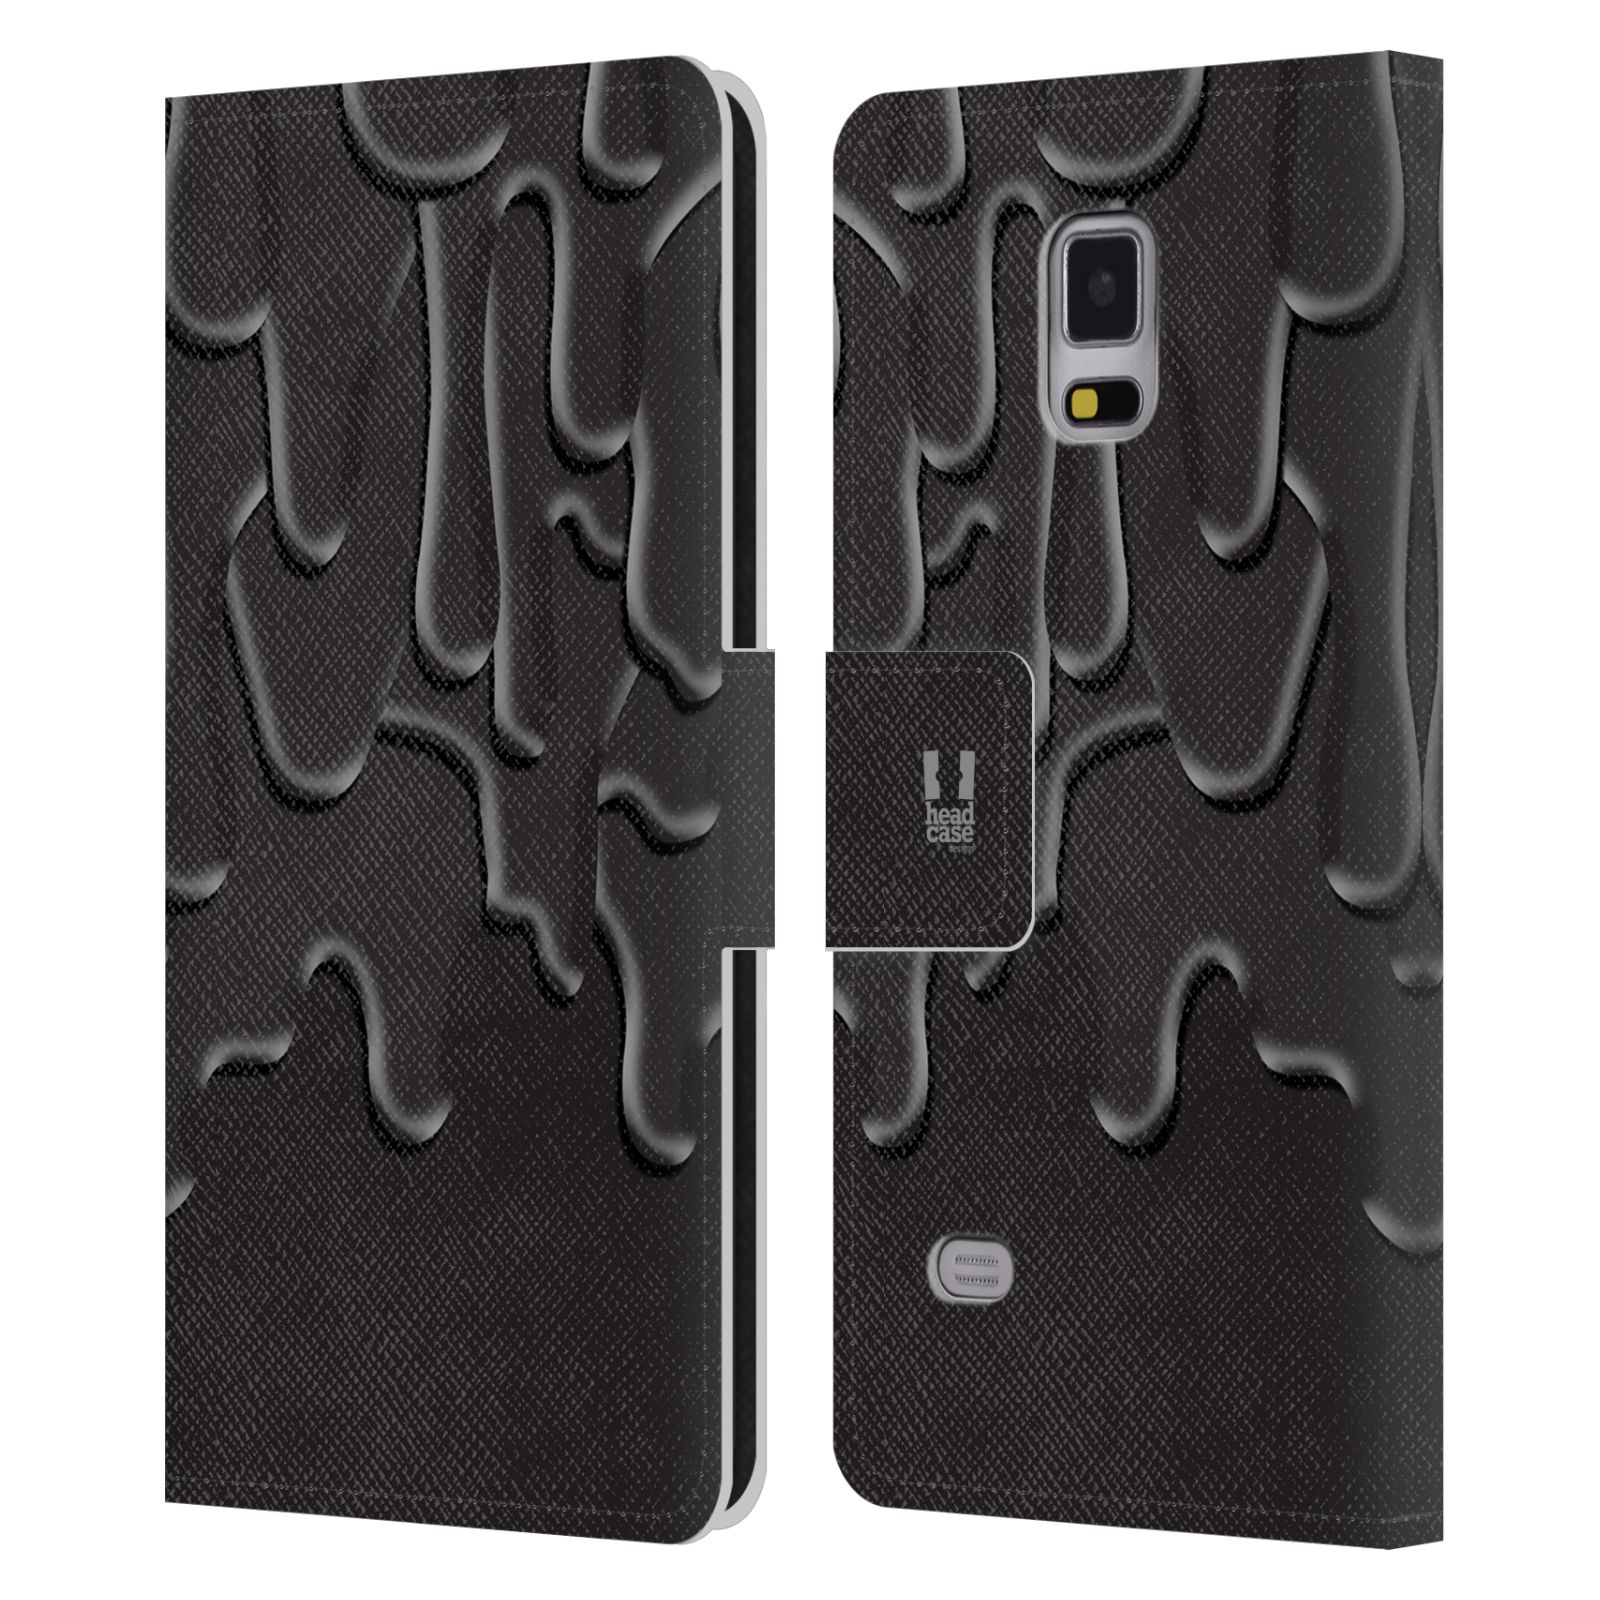 HEAD CASE Flipové pouzdro pro mobil Samsung Galaxy Note 4 ZÁPLAVA BARVA černá